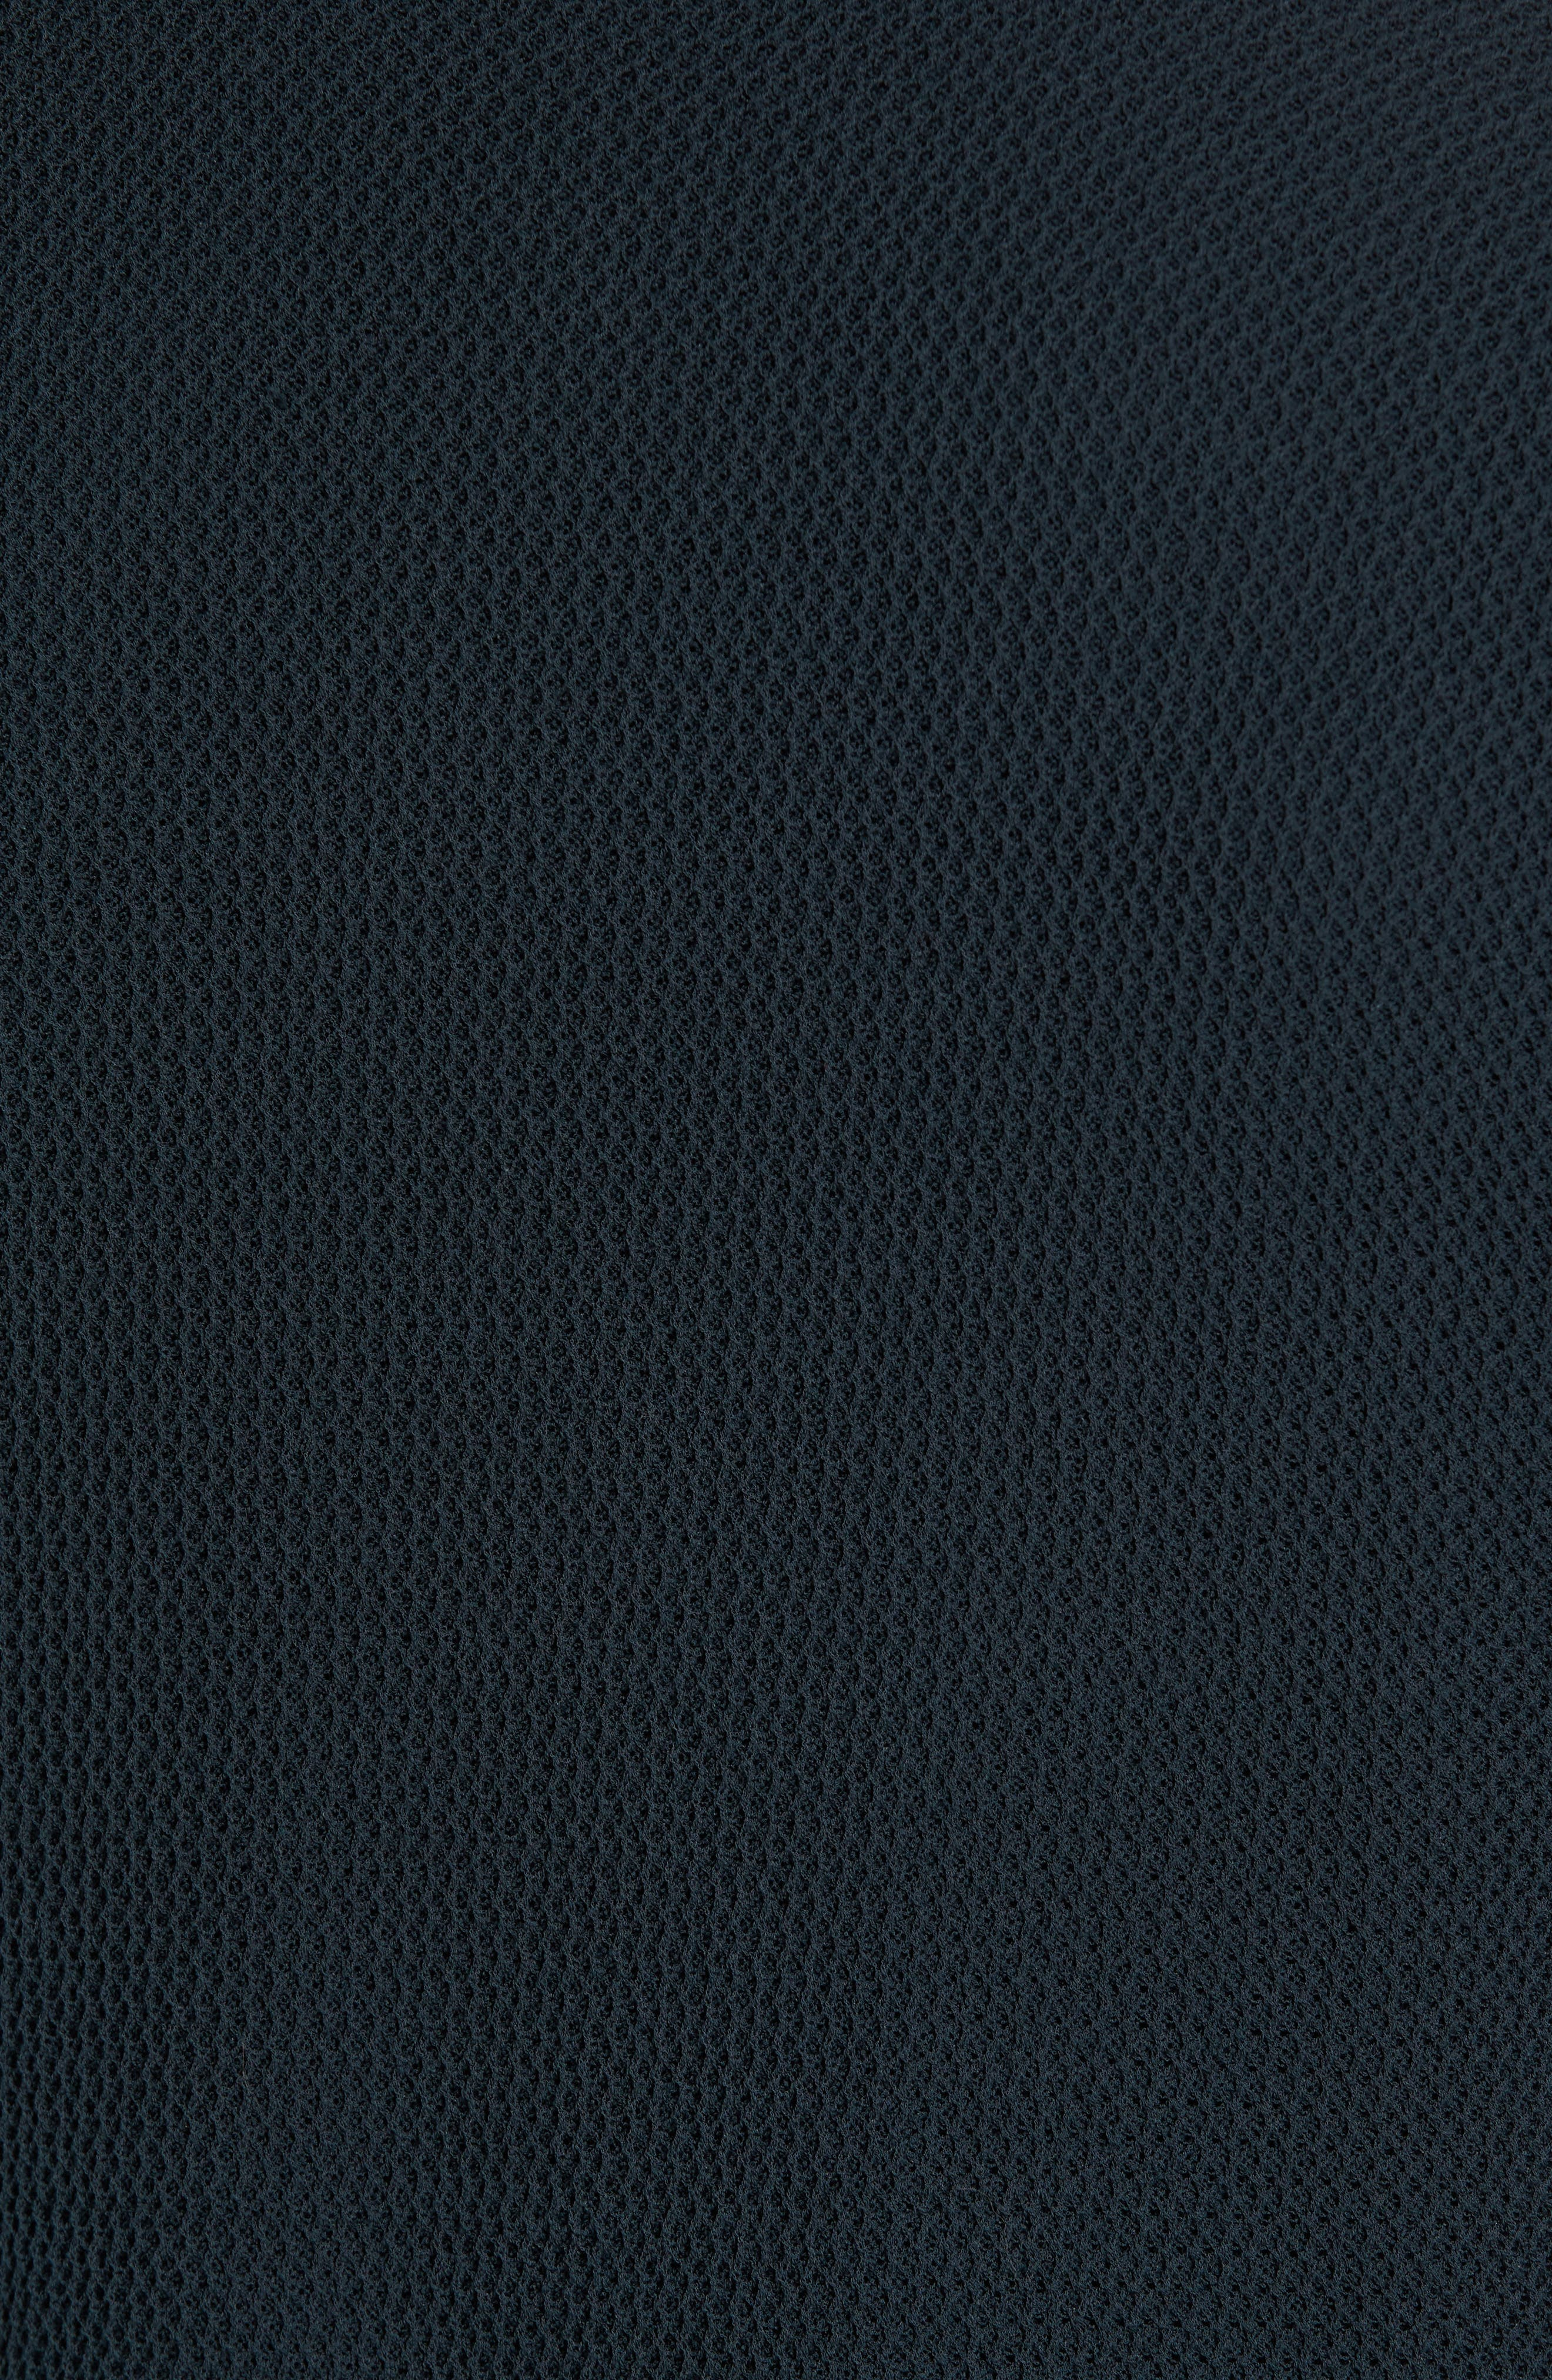 Mesh Crewneck Sweater,                             Alternate thumbnail 10, color,